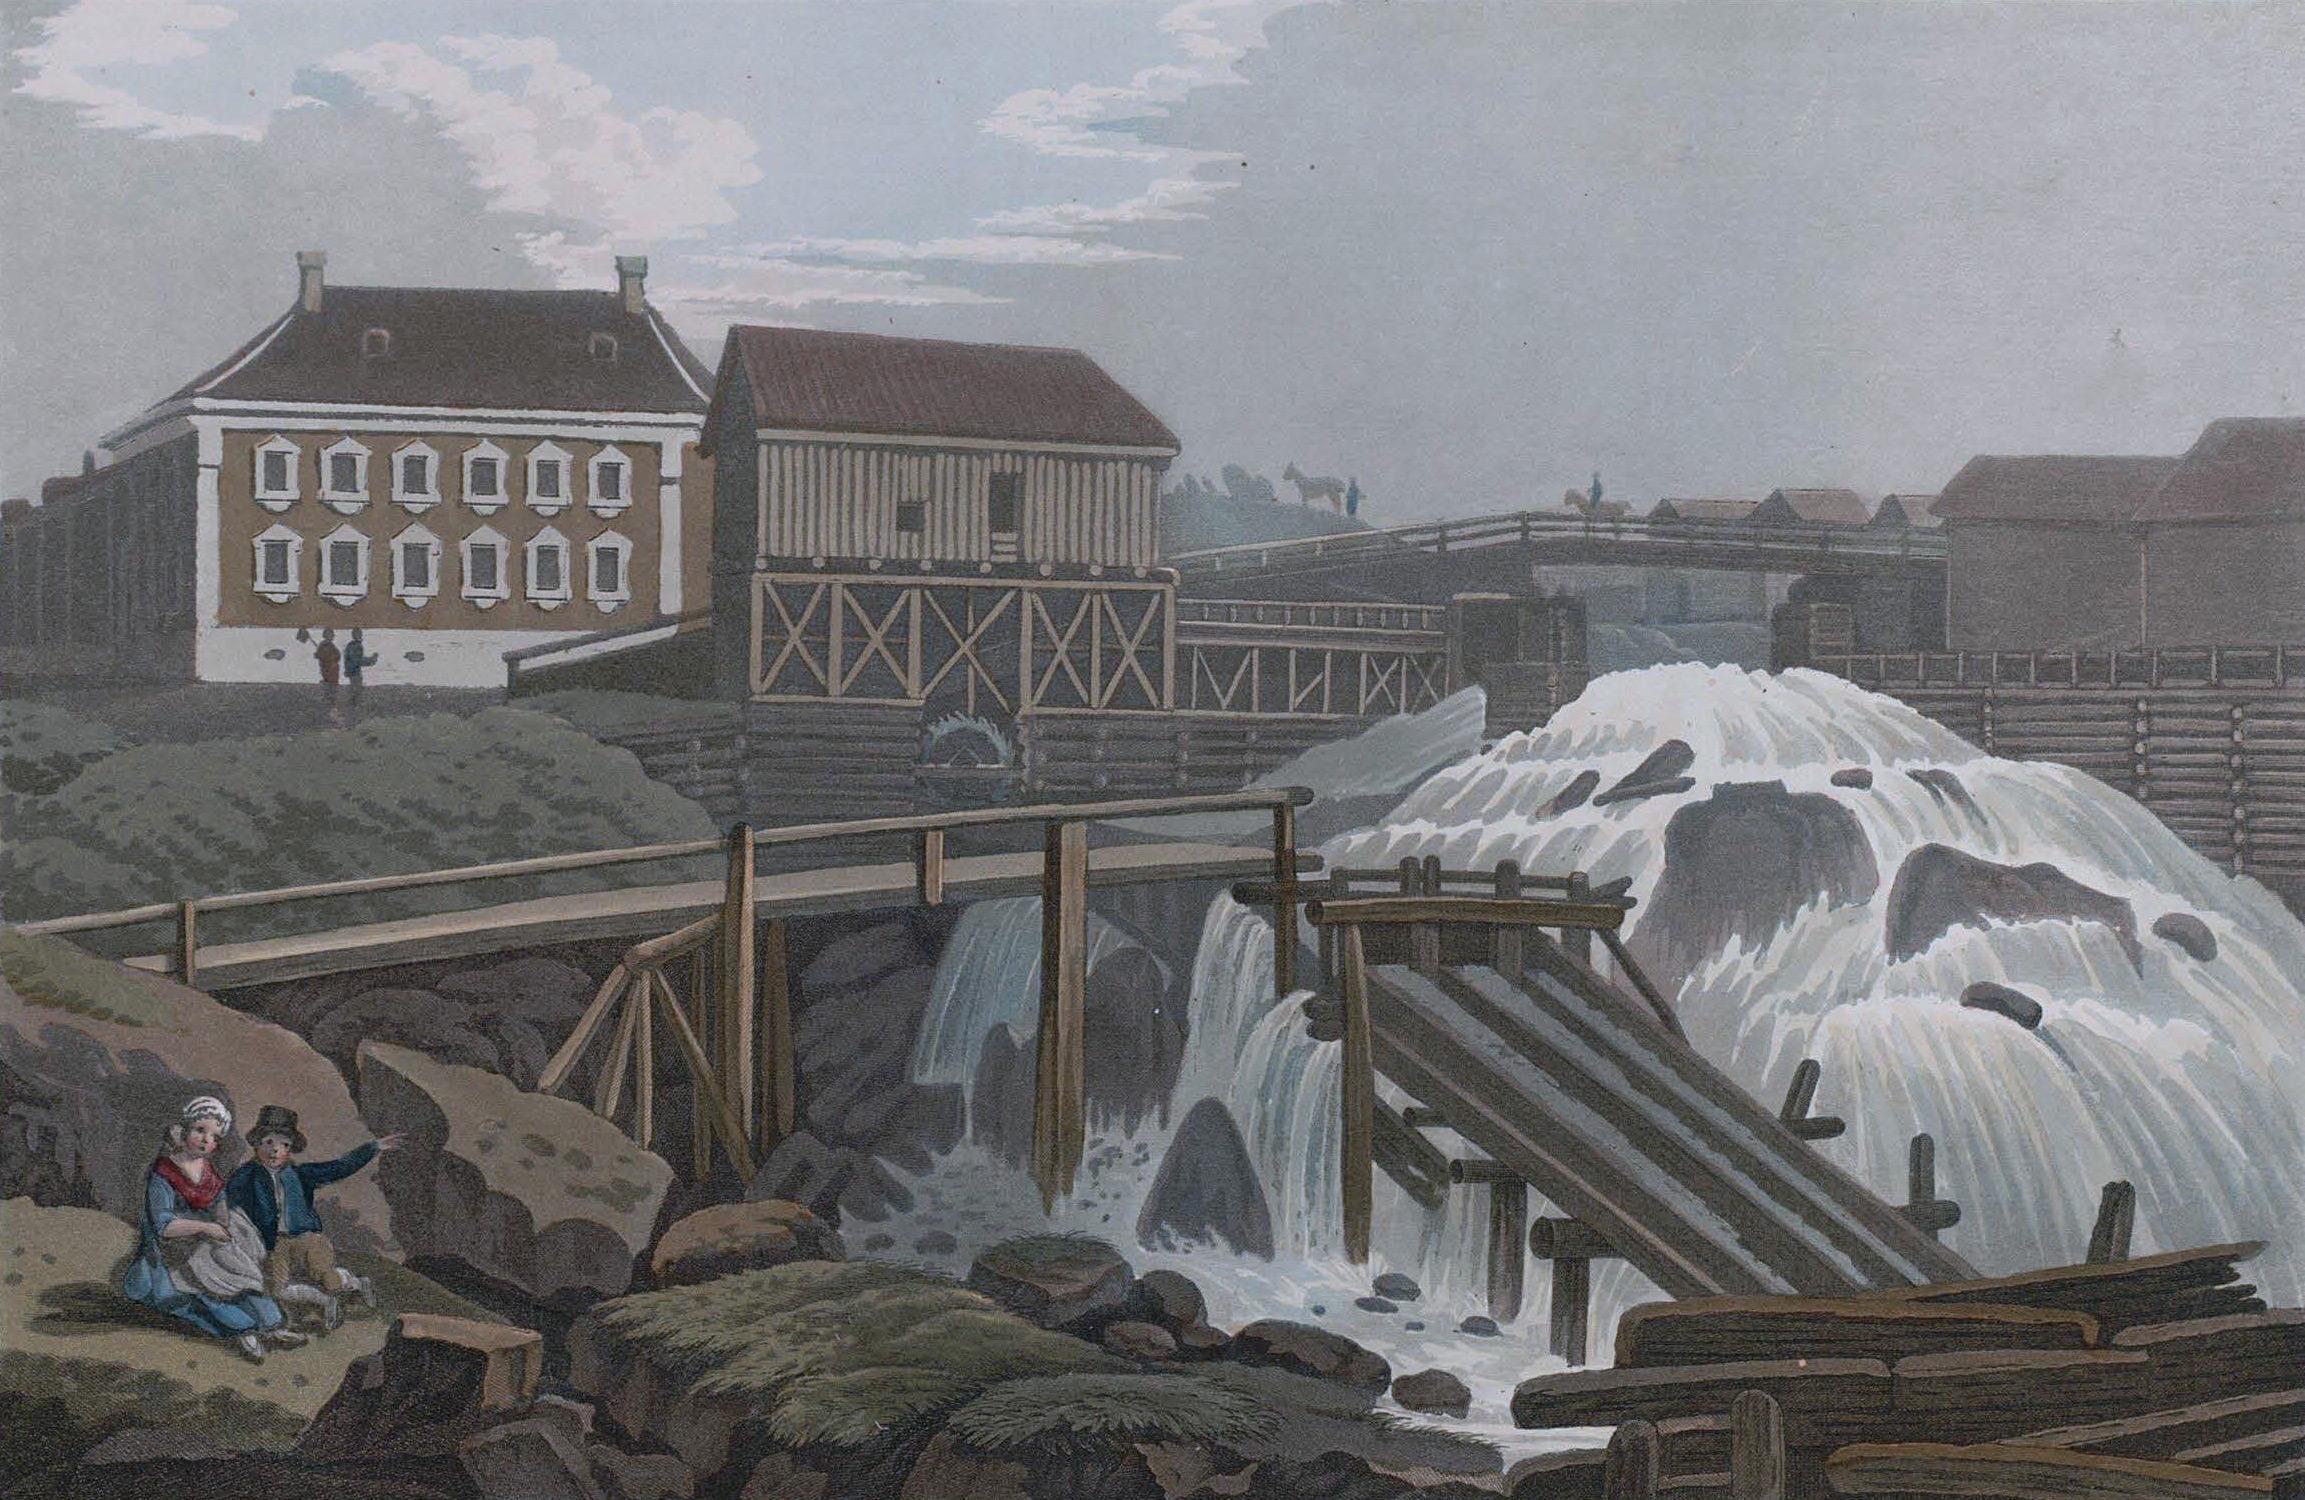 1784 in Norway